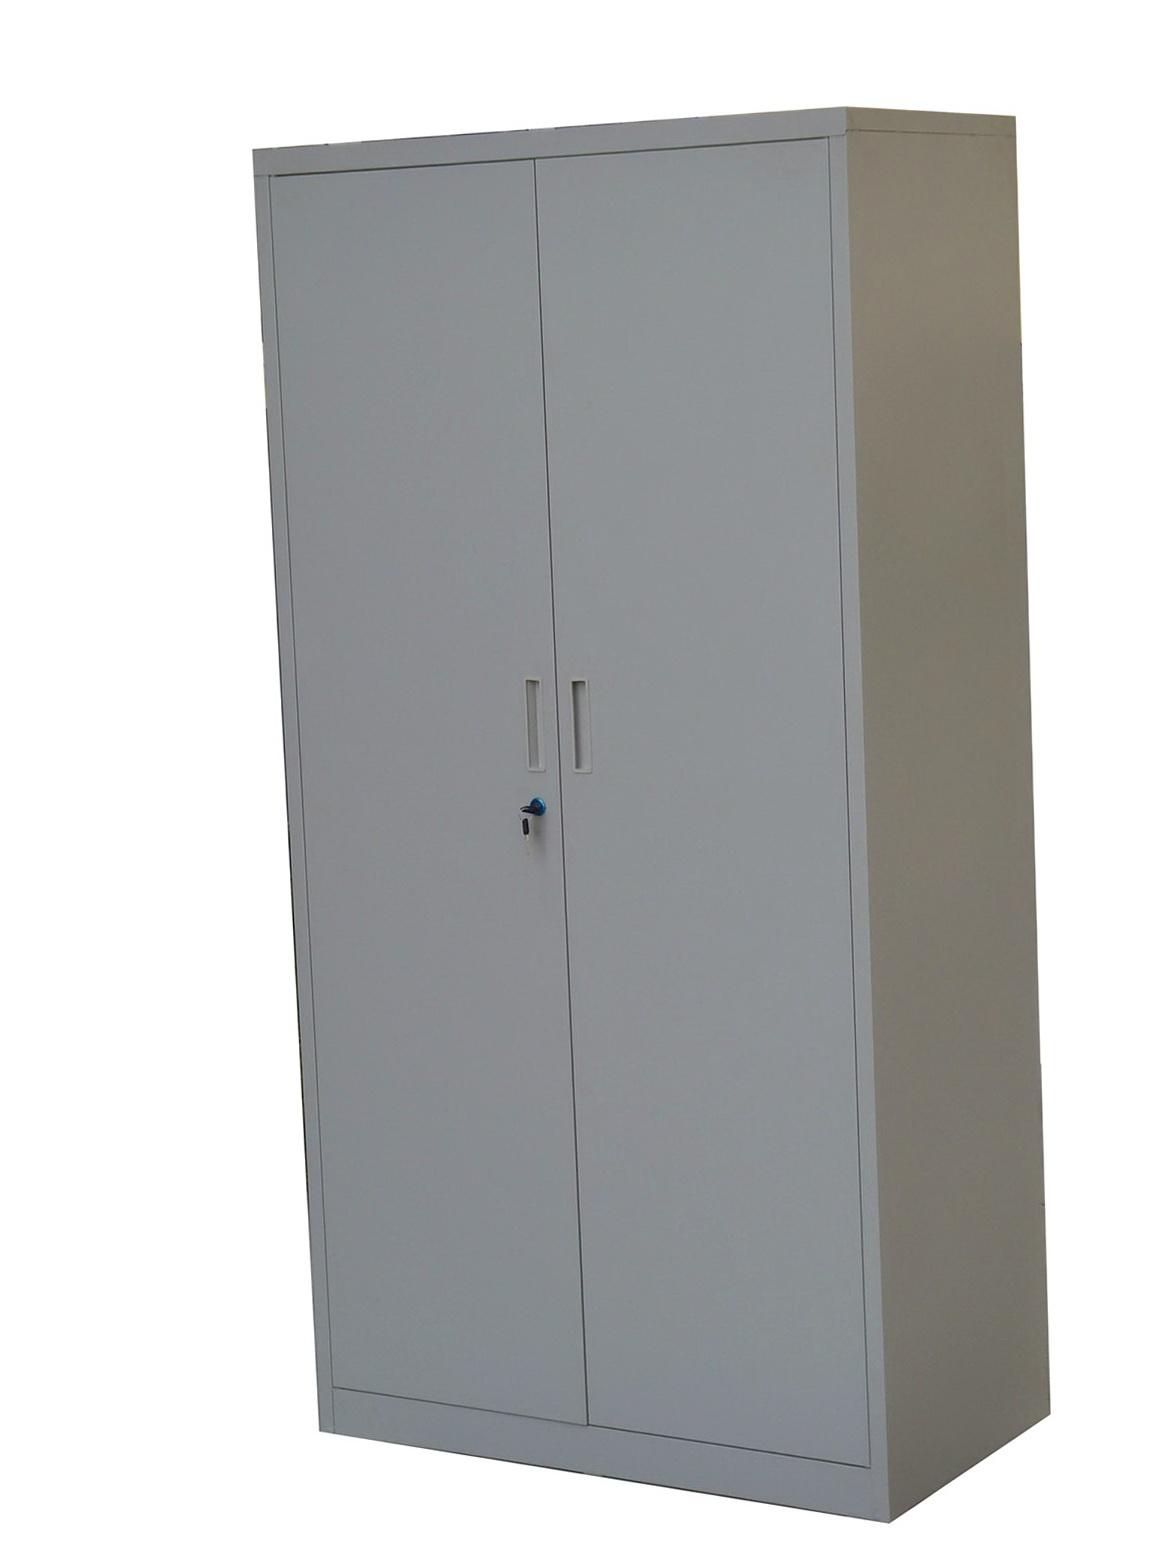 Metal Wardrobe Closet Cabinet Home Design Ideas